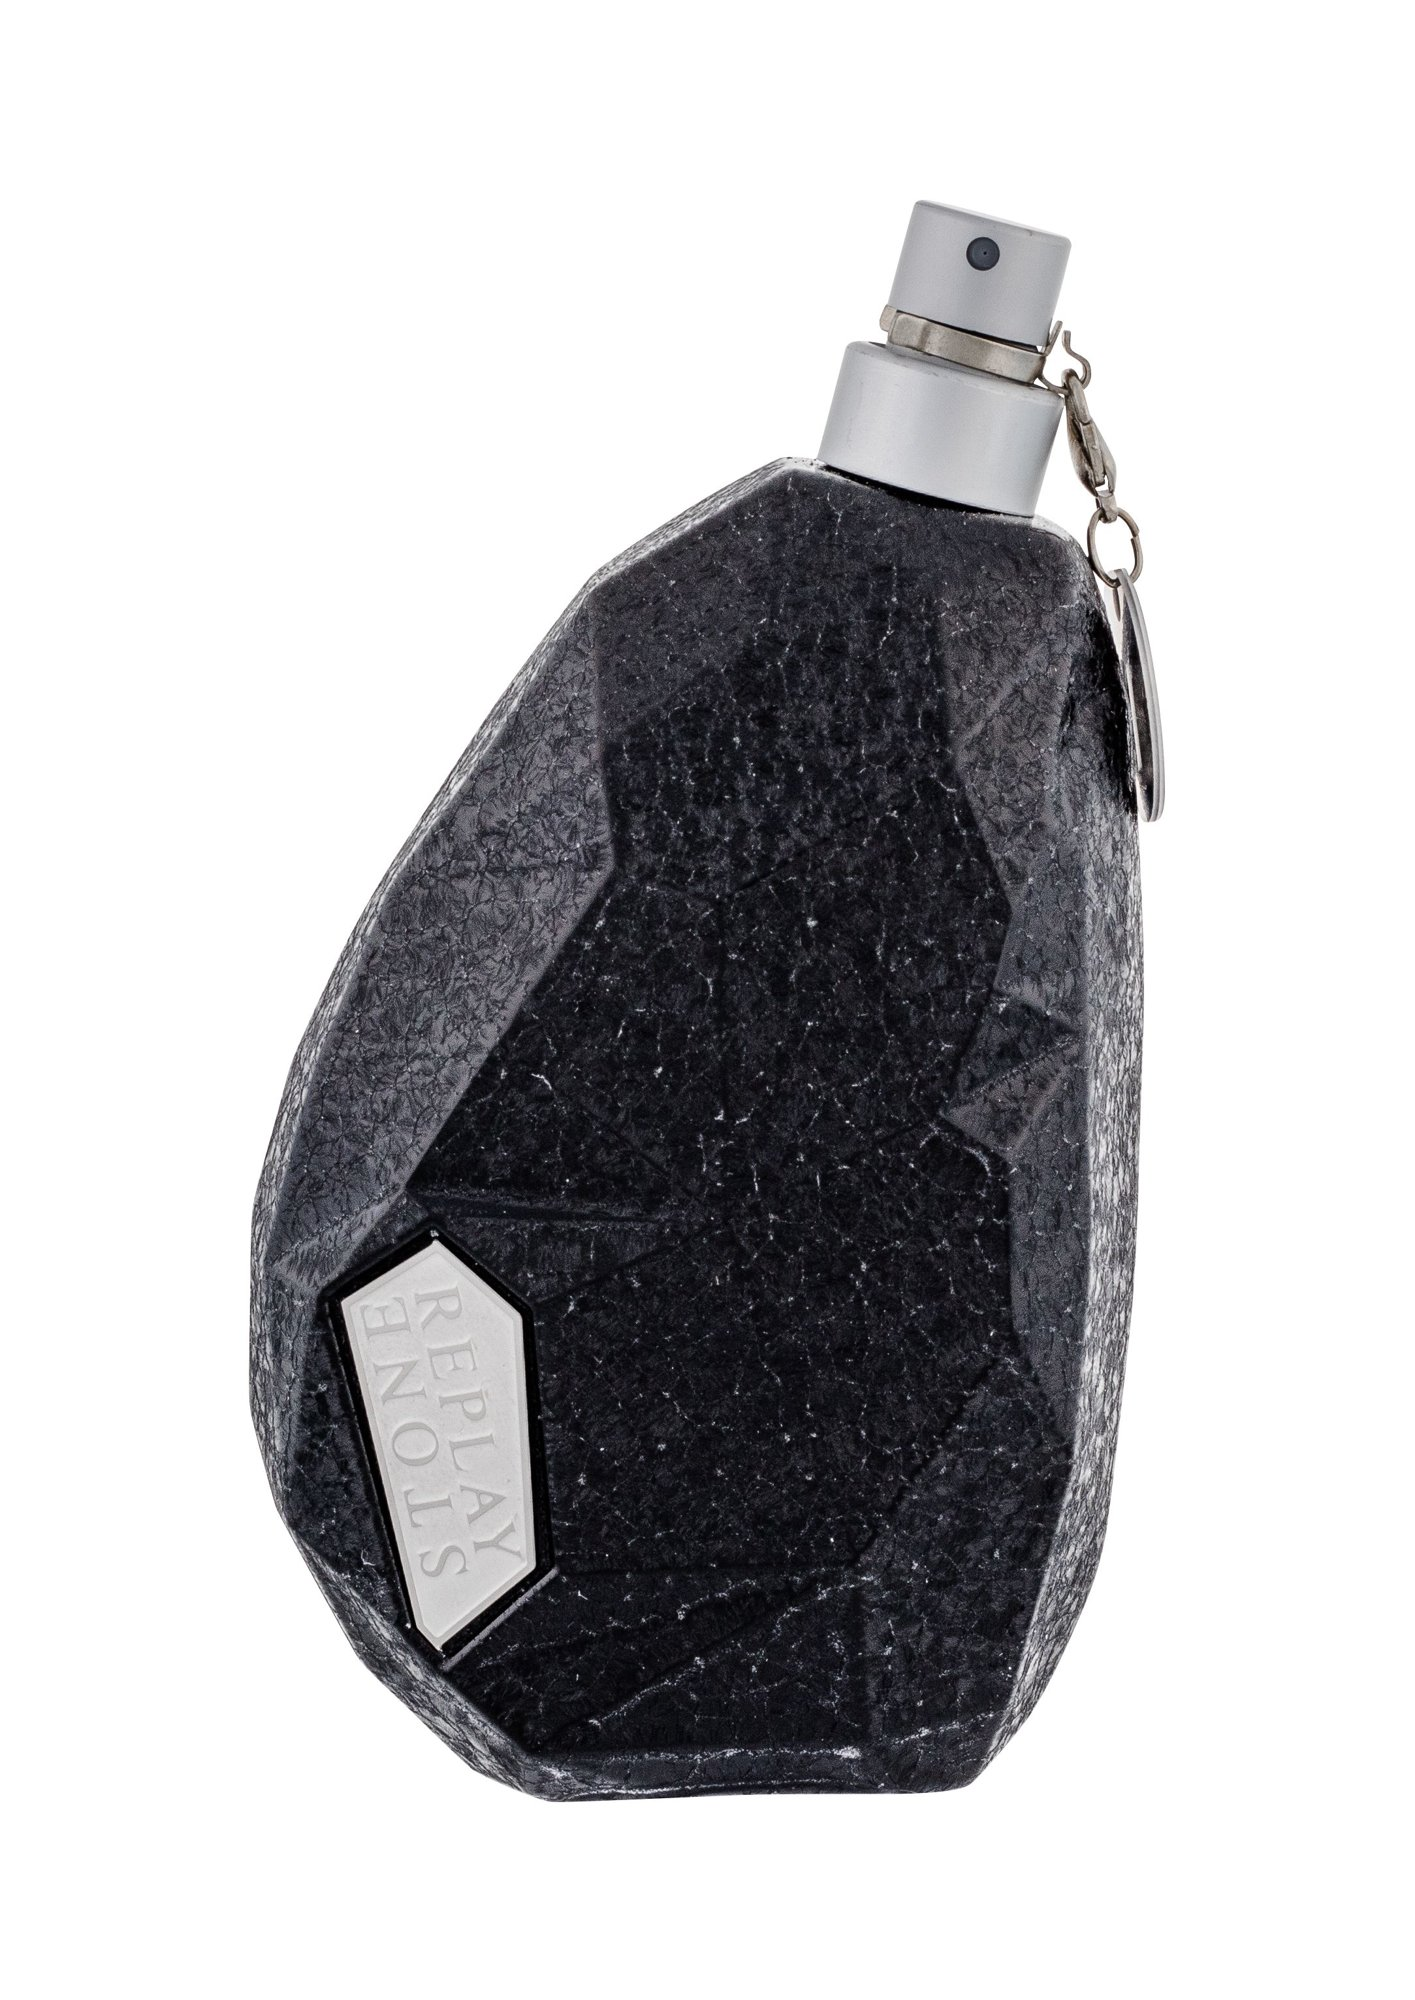 Replay Stone Eau de Toilette 100ml